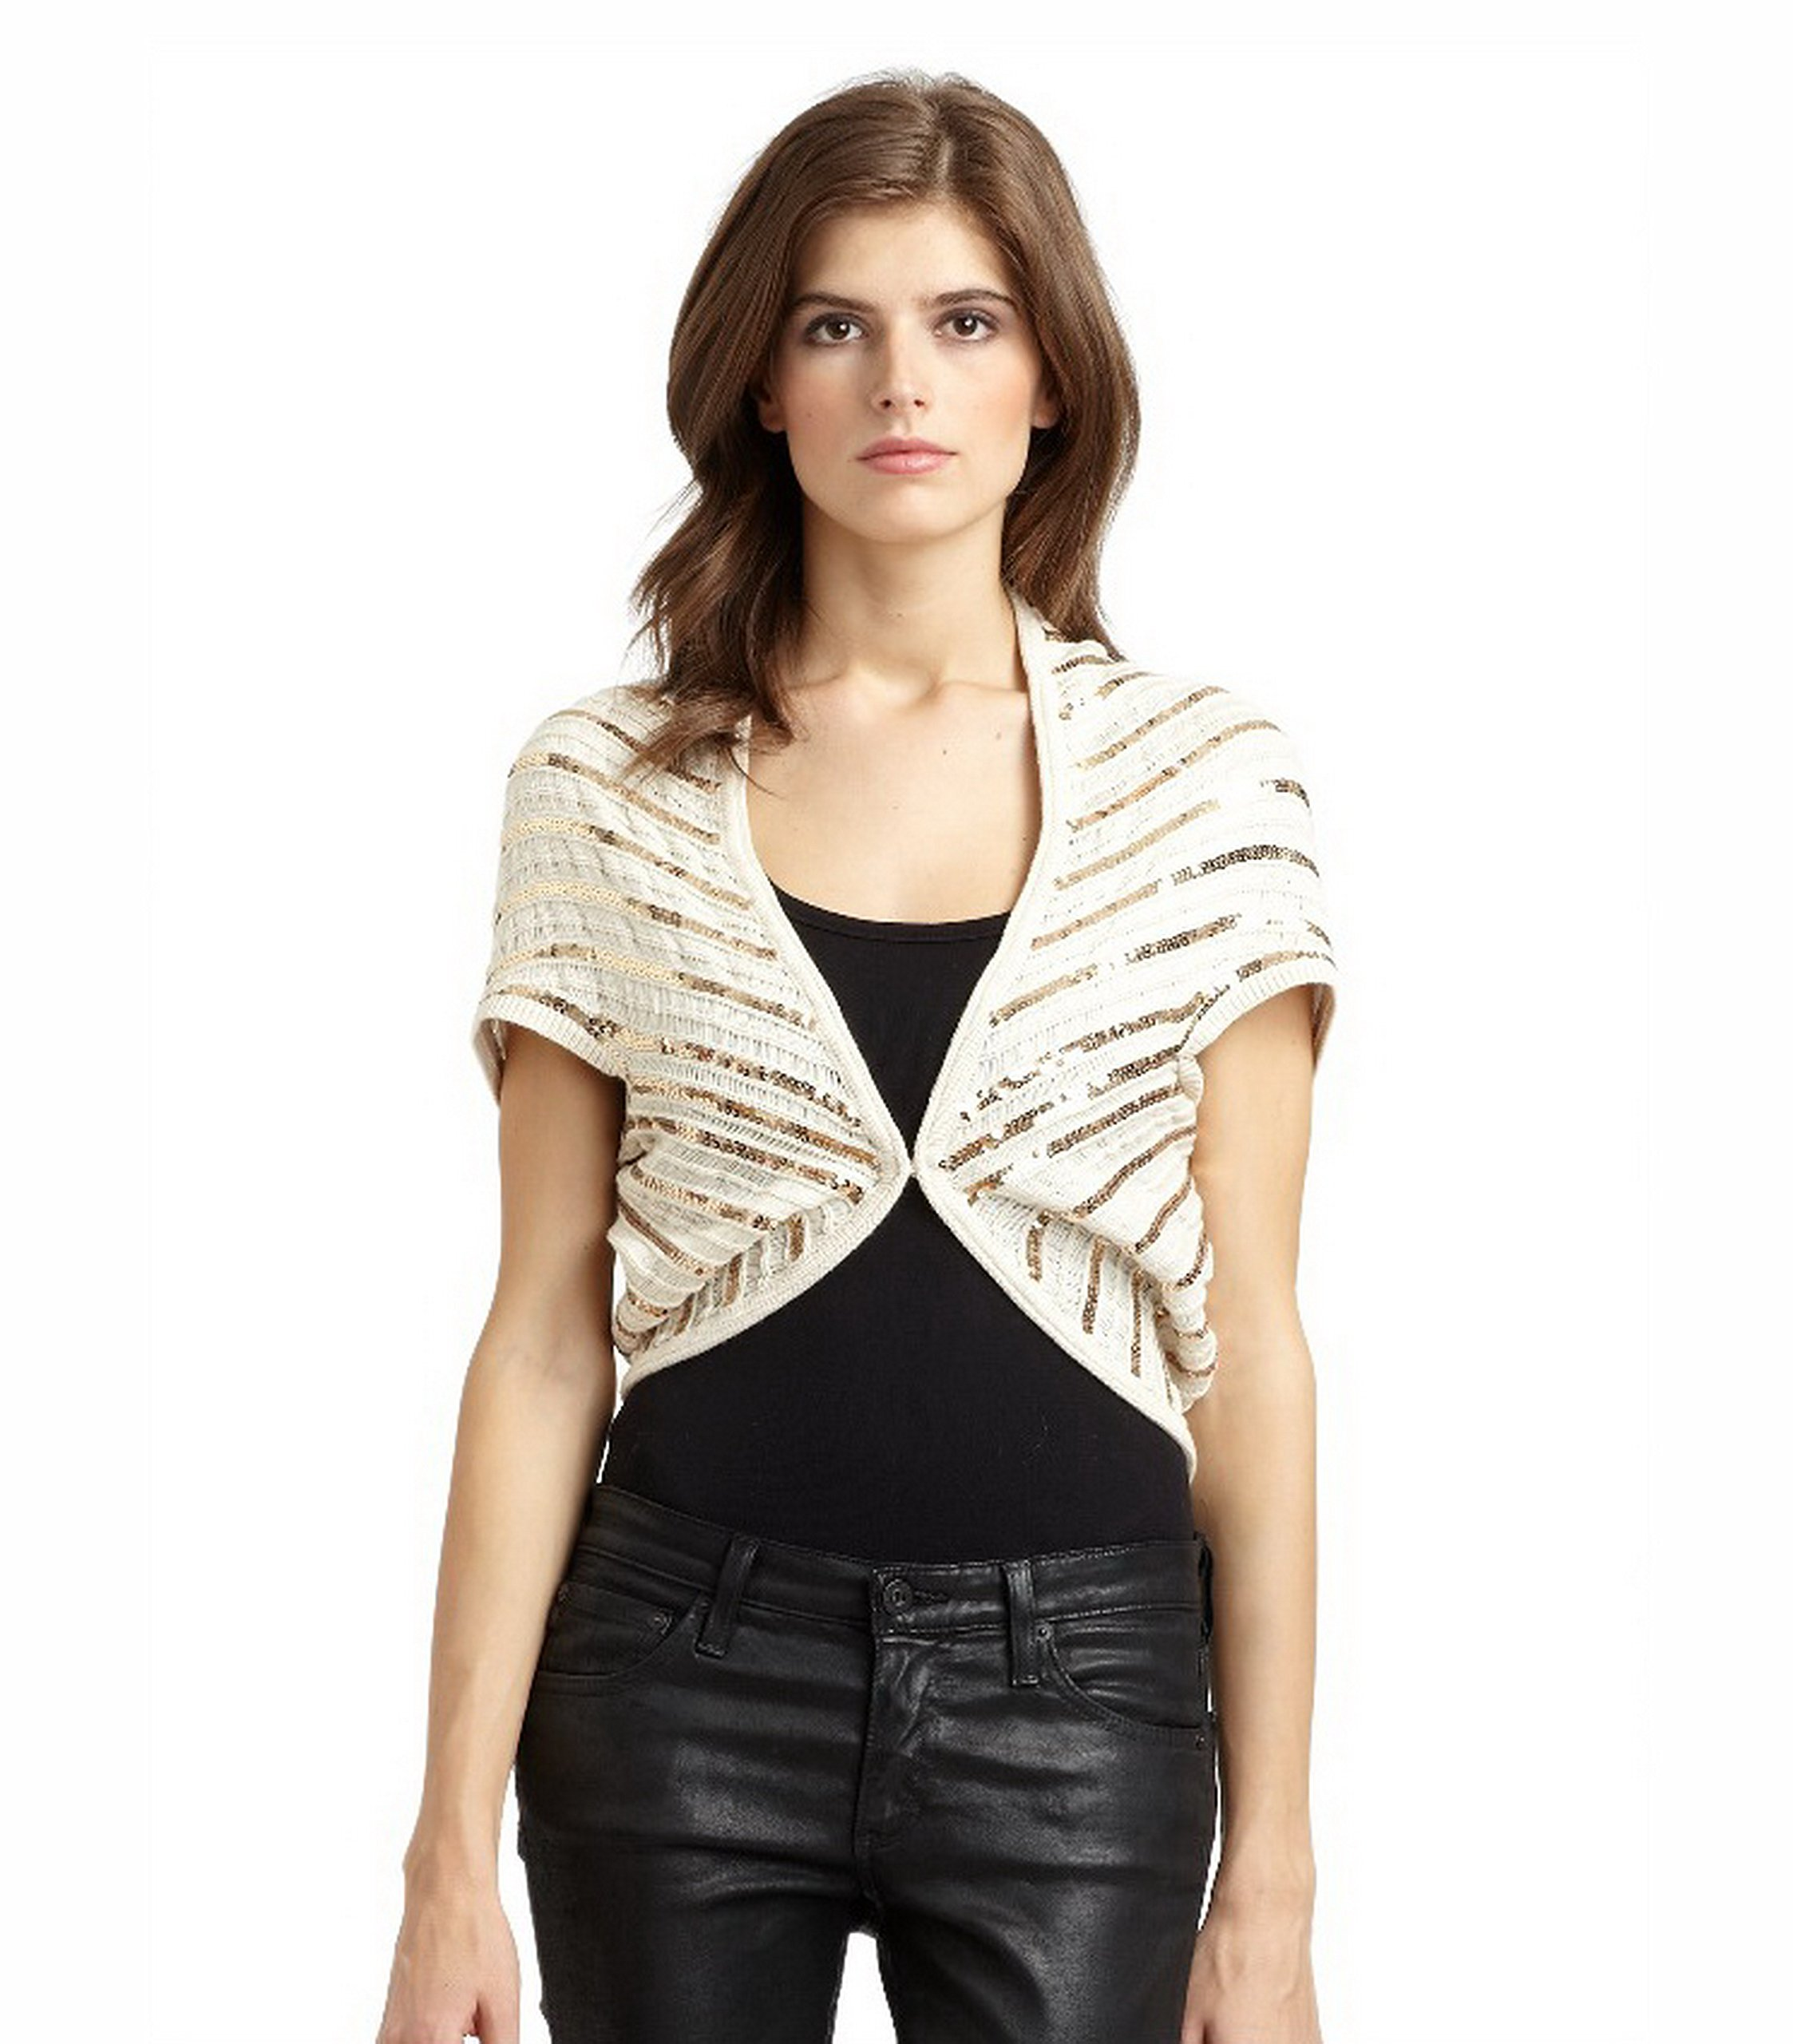 Alice & Olivia Womens Sequin Accent Cotton Knit Shrug SZ S Beige/Gold 60511E